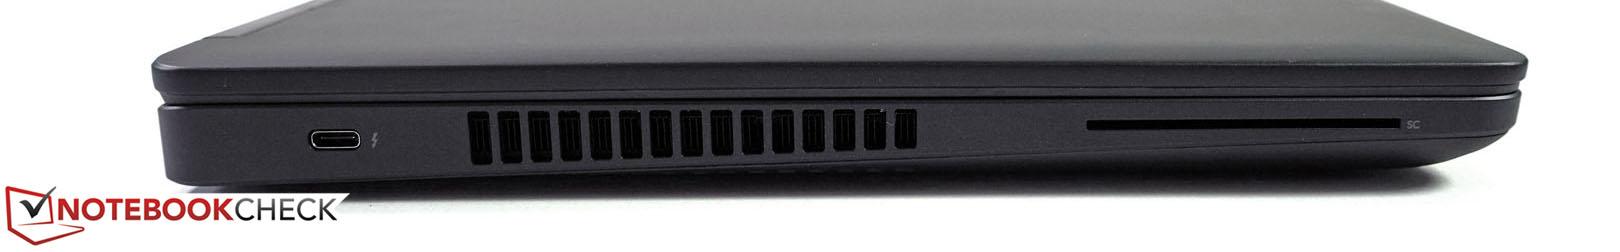 Dell precision 3510 links Laptop Lê Sơn